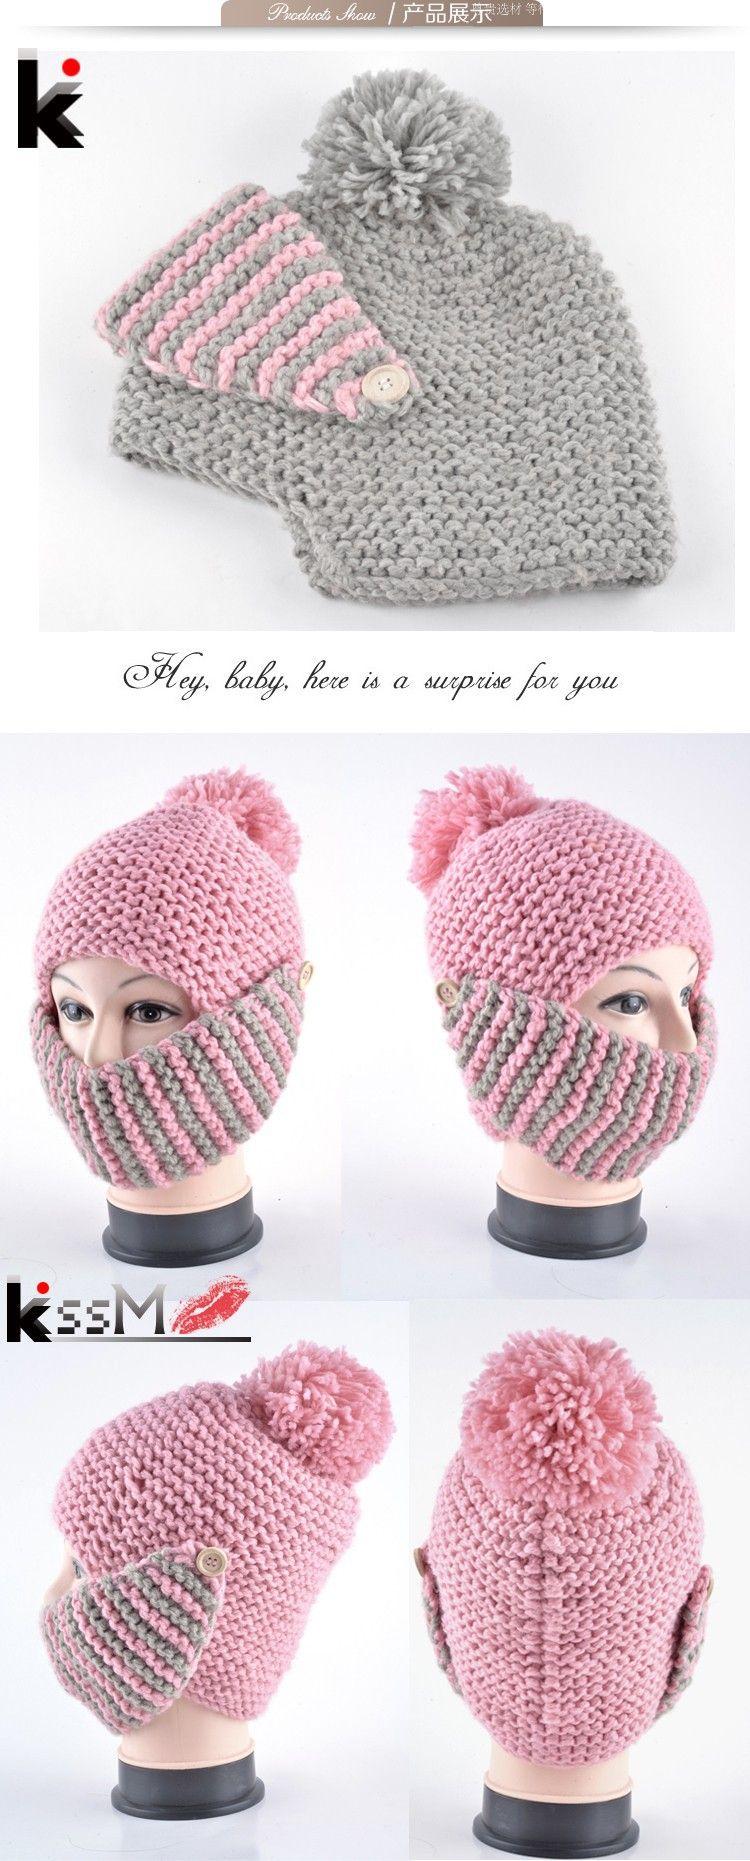 Pin by Ashley Christman on crochet | Pinterest | Gorro tejido ...